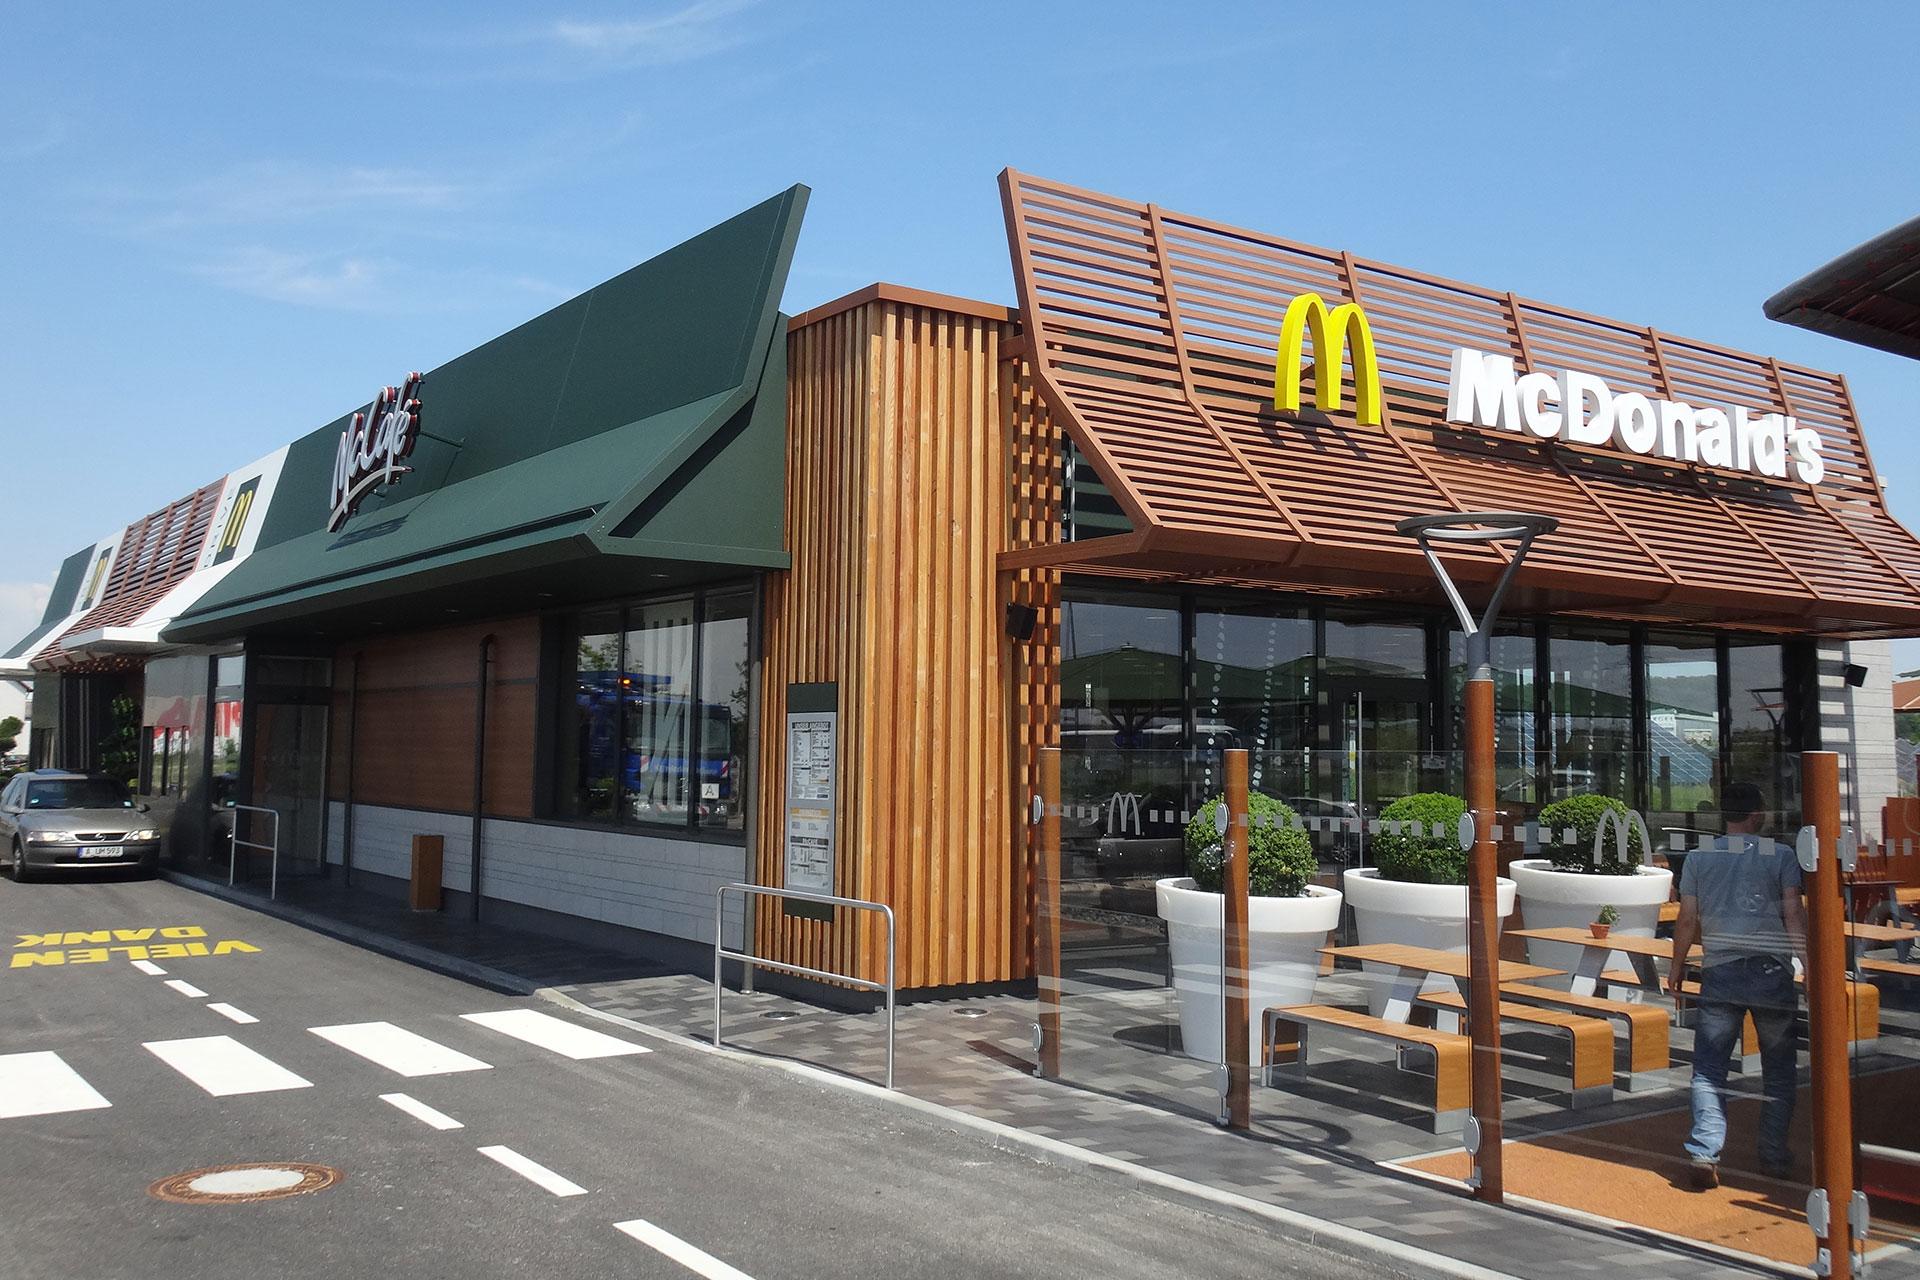 Projekte: Neubau McDonald's-Restaurants Standard-Design - Neubau McDonald's Restaurant Friedberg